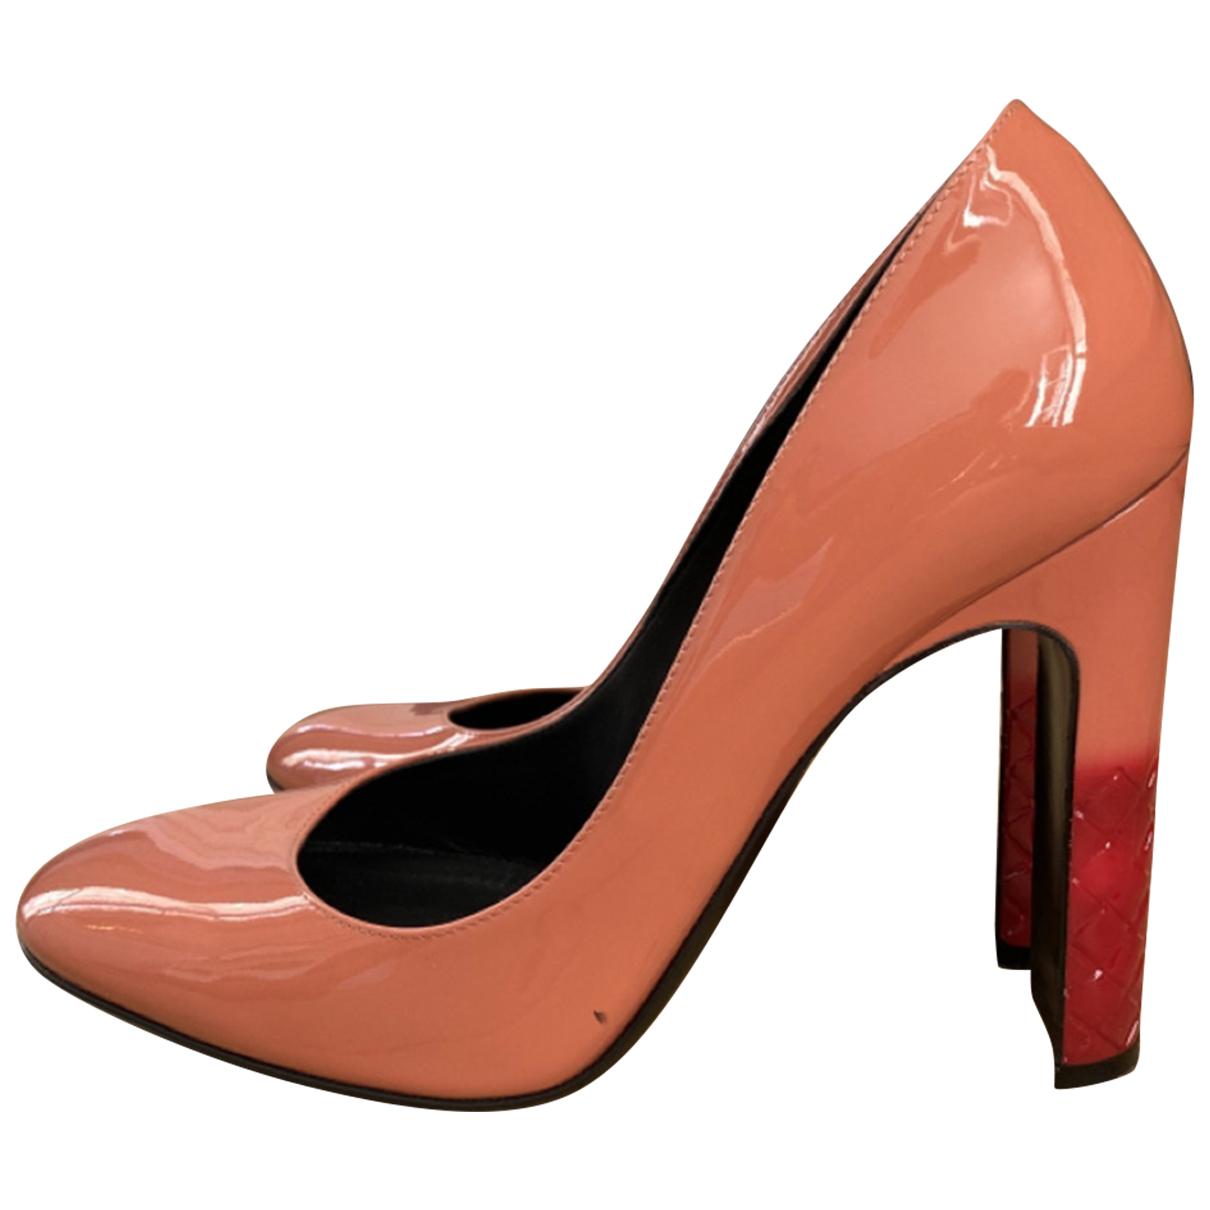 Bottega Veneta - Escarpins   pour femme en cuir verni - rose